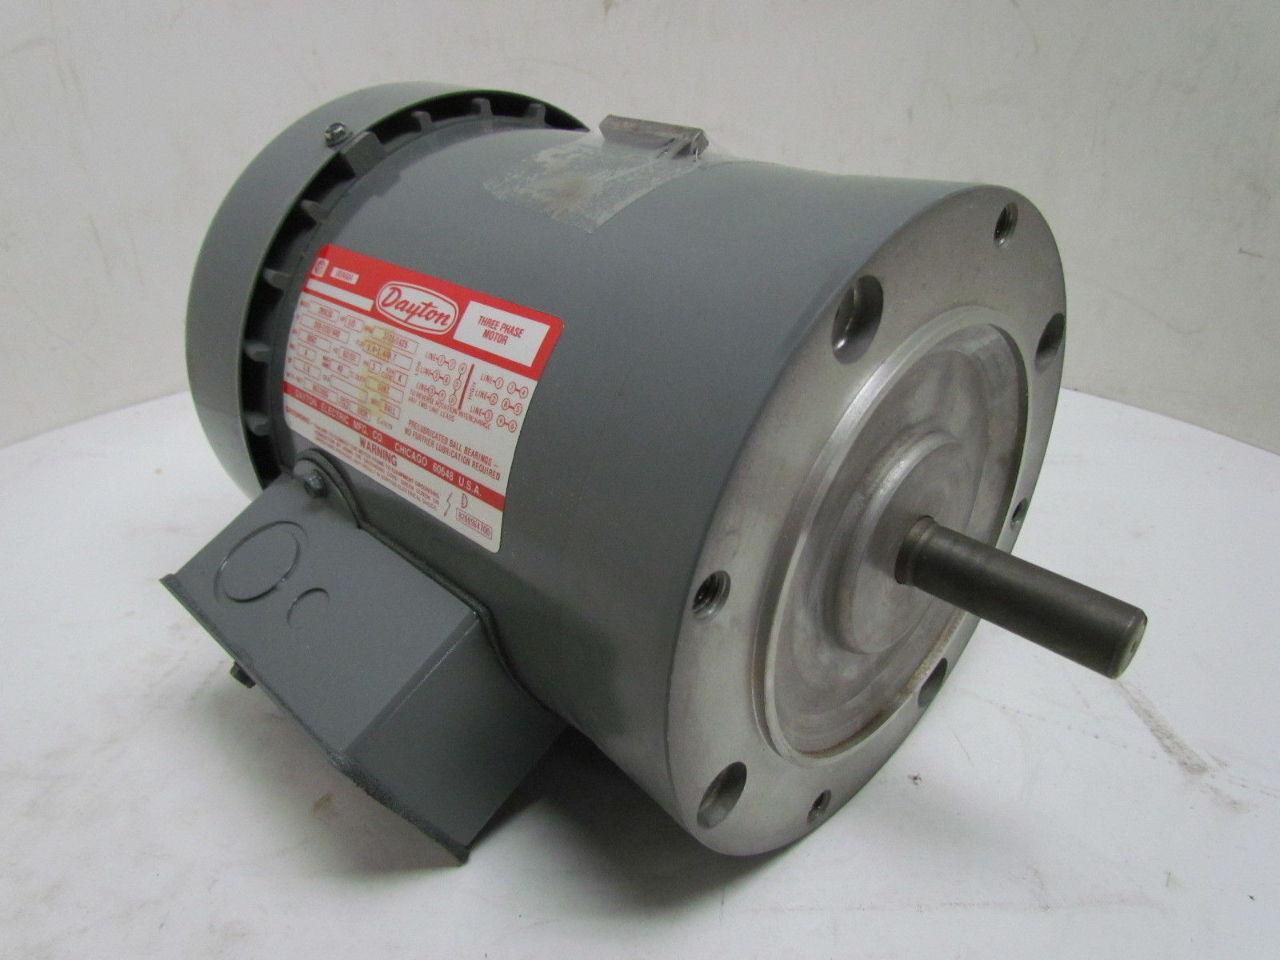 Dayton 2n915g 1 3 hp 1725 rpm 208 220 440 volt 56c frame for 1 hp electric motor 1725 rpm